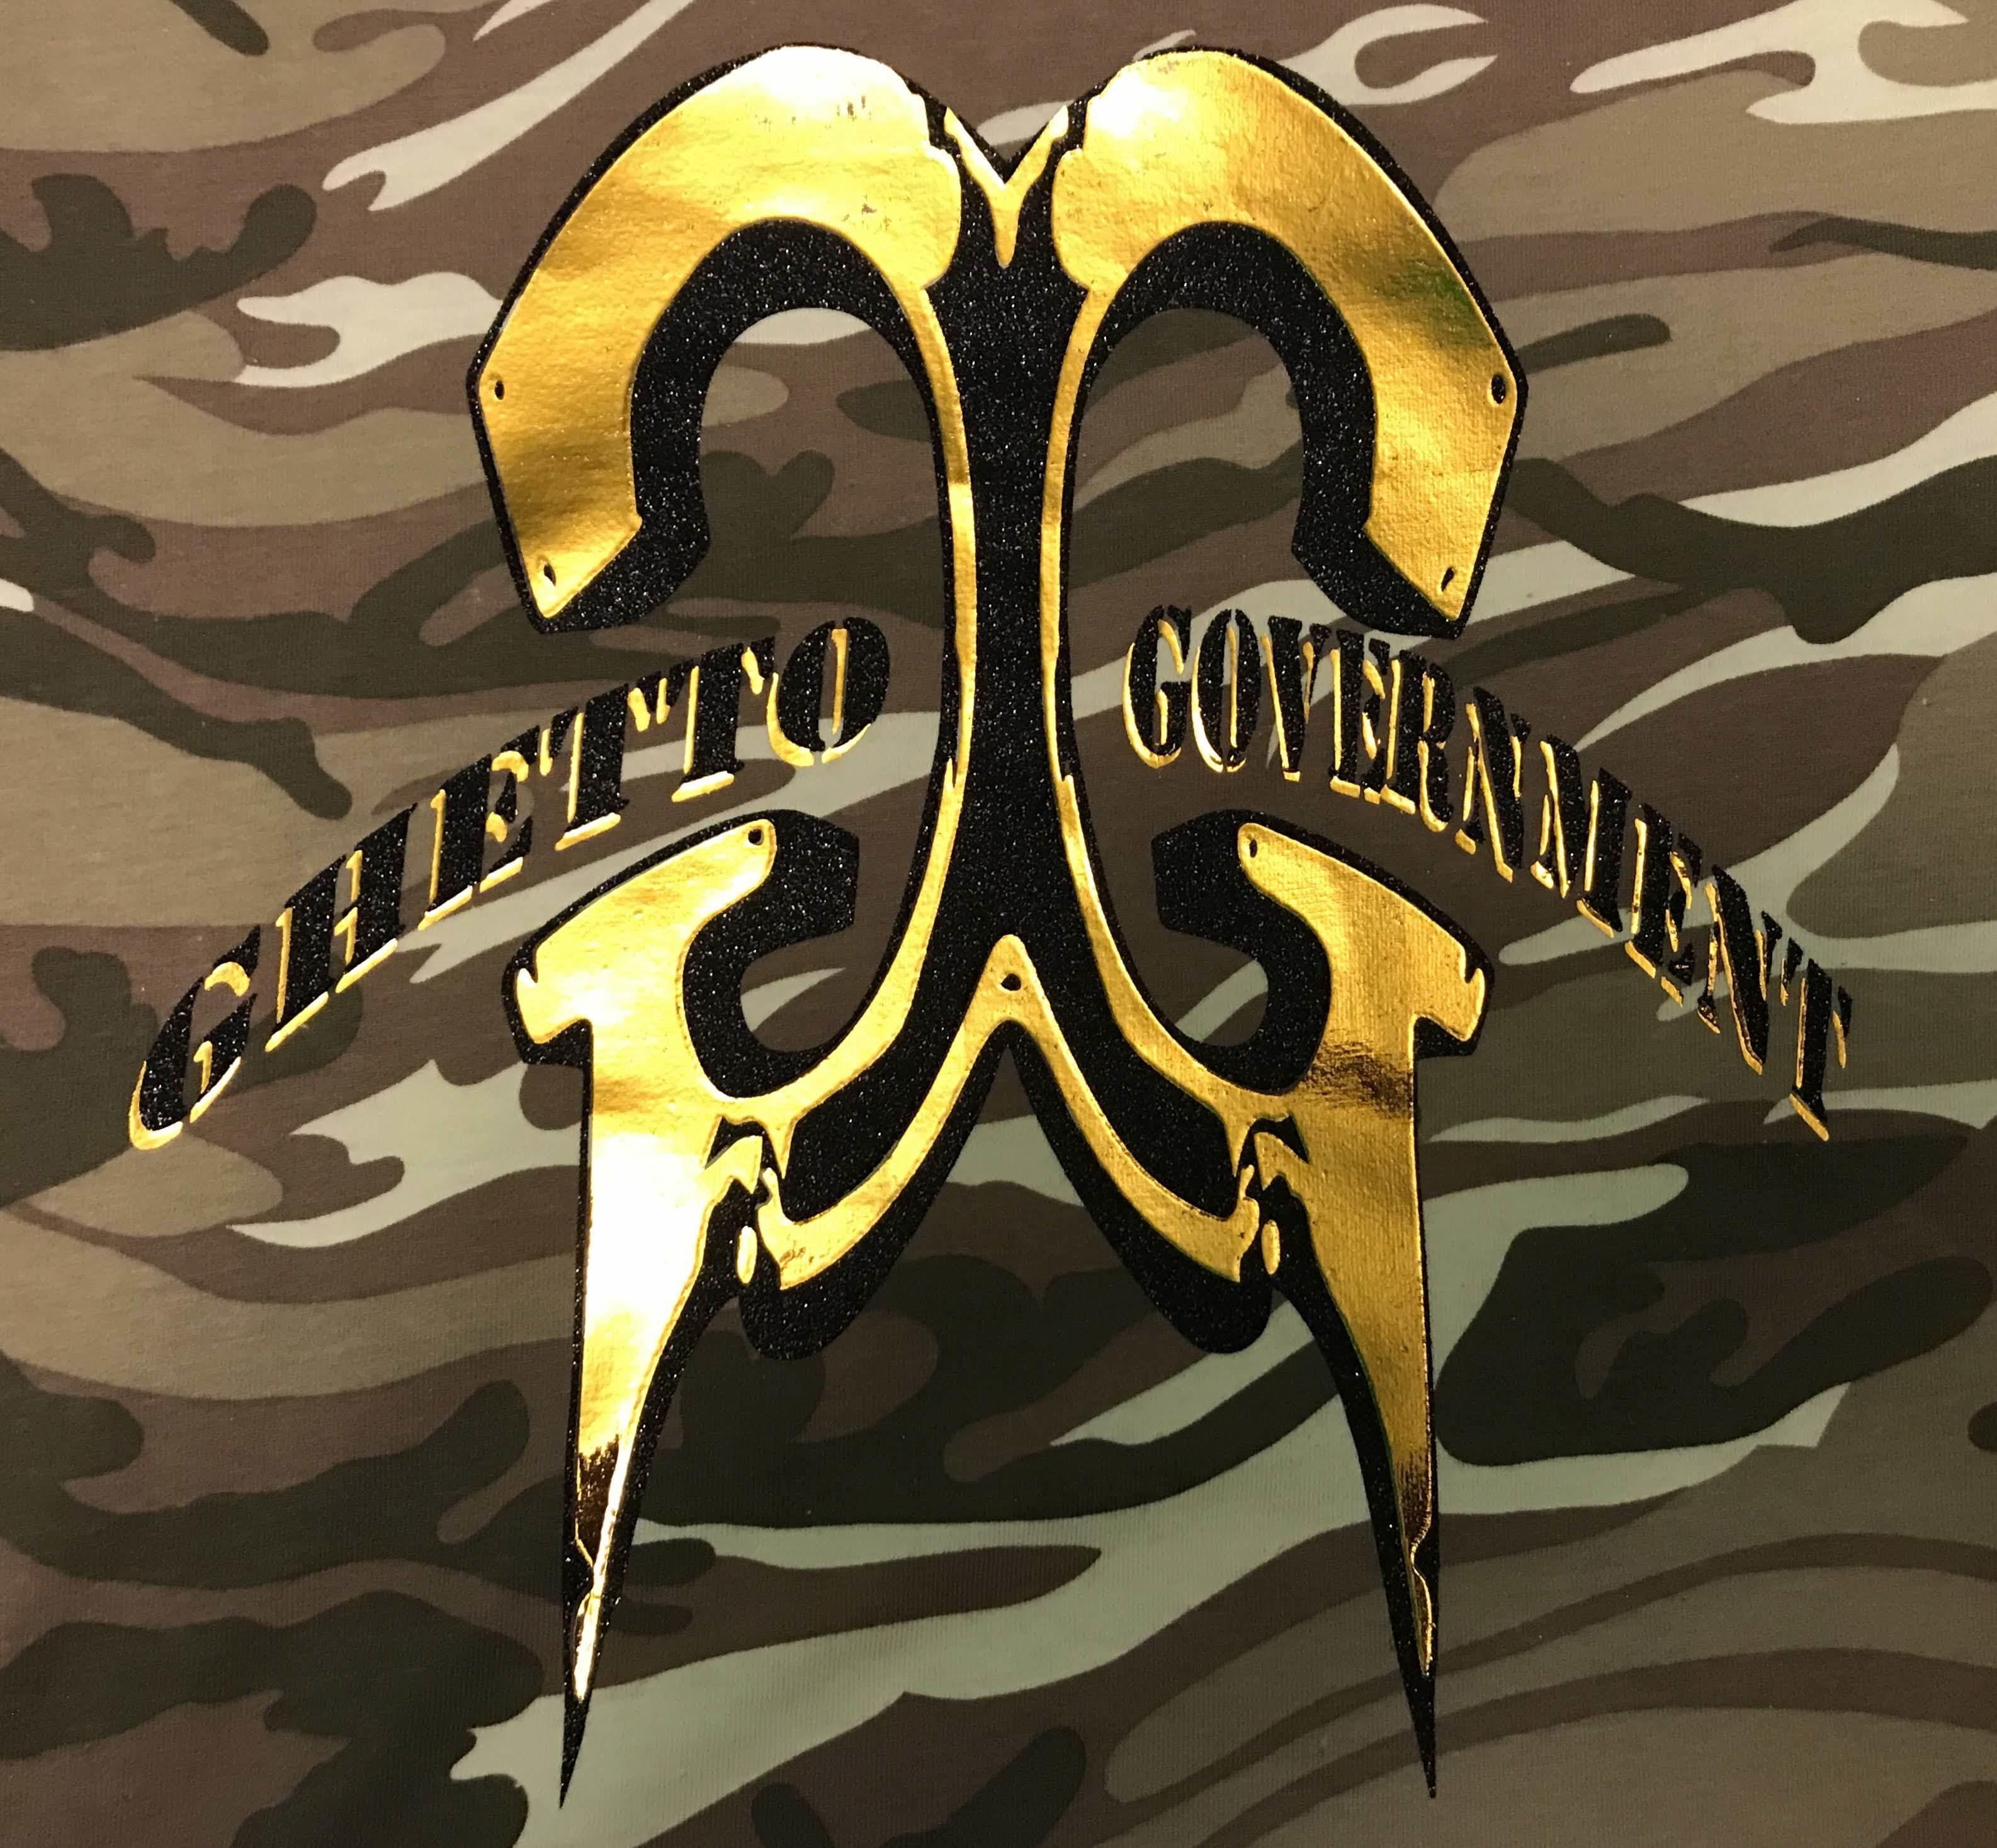 Ghetto Government sand Camo Tee gld/blk logo 00027